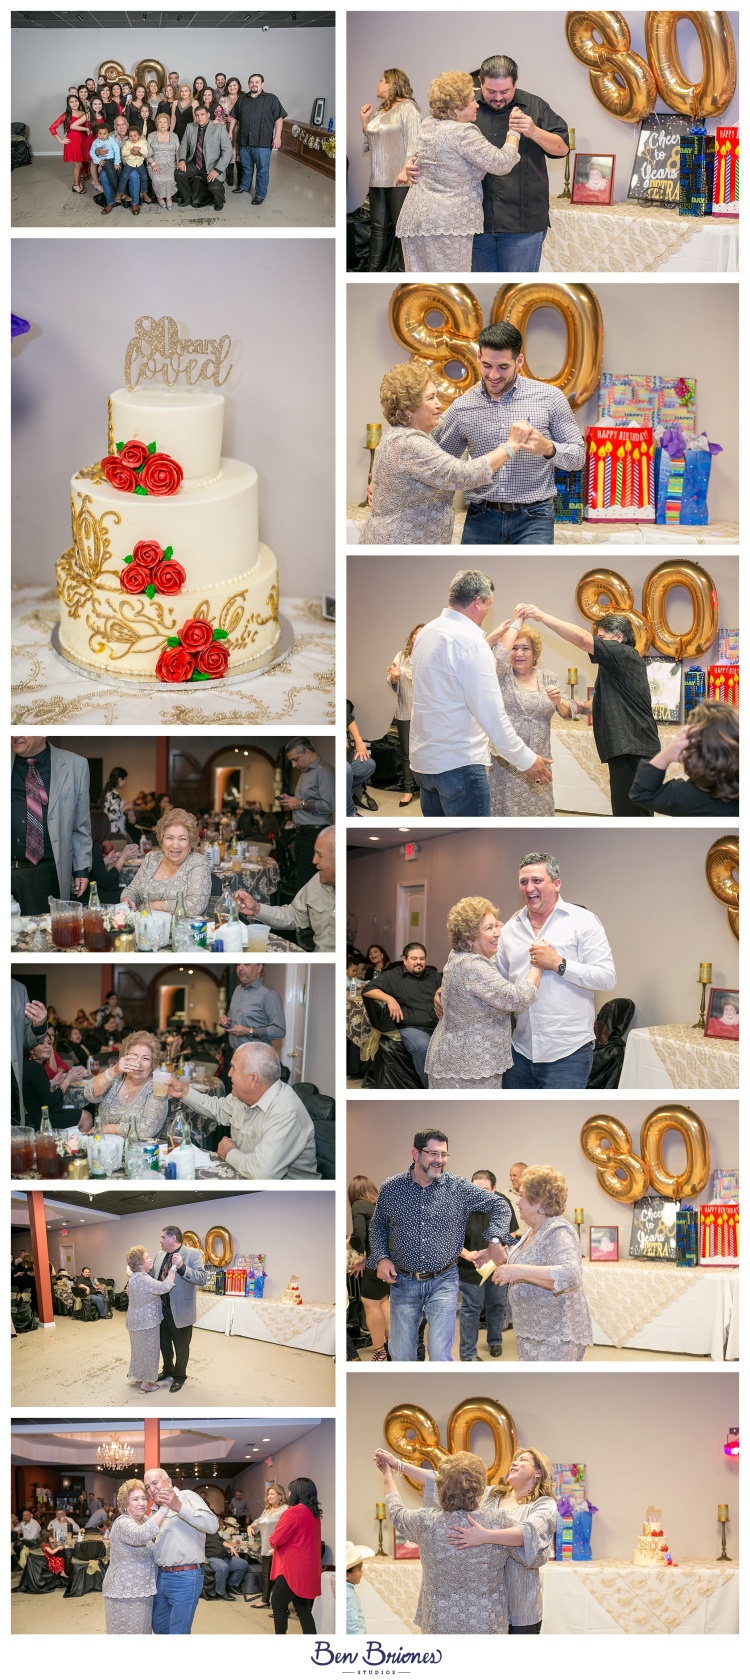 03.10.18_PRINT_80th Birthday Party-0300_WEB